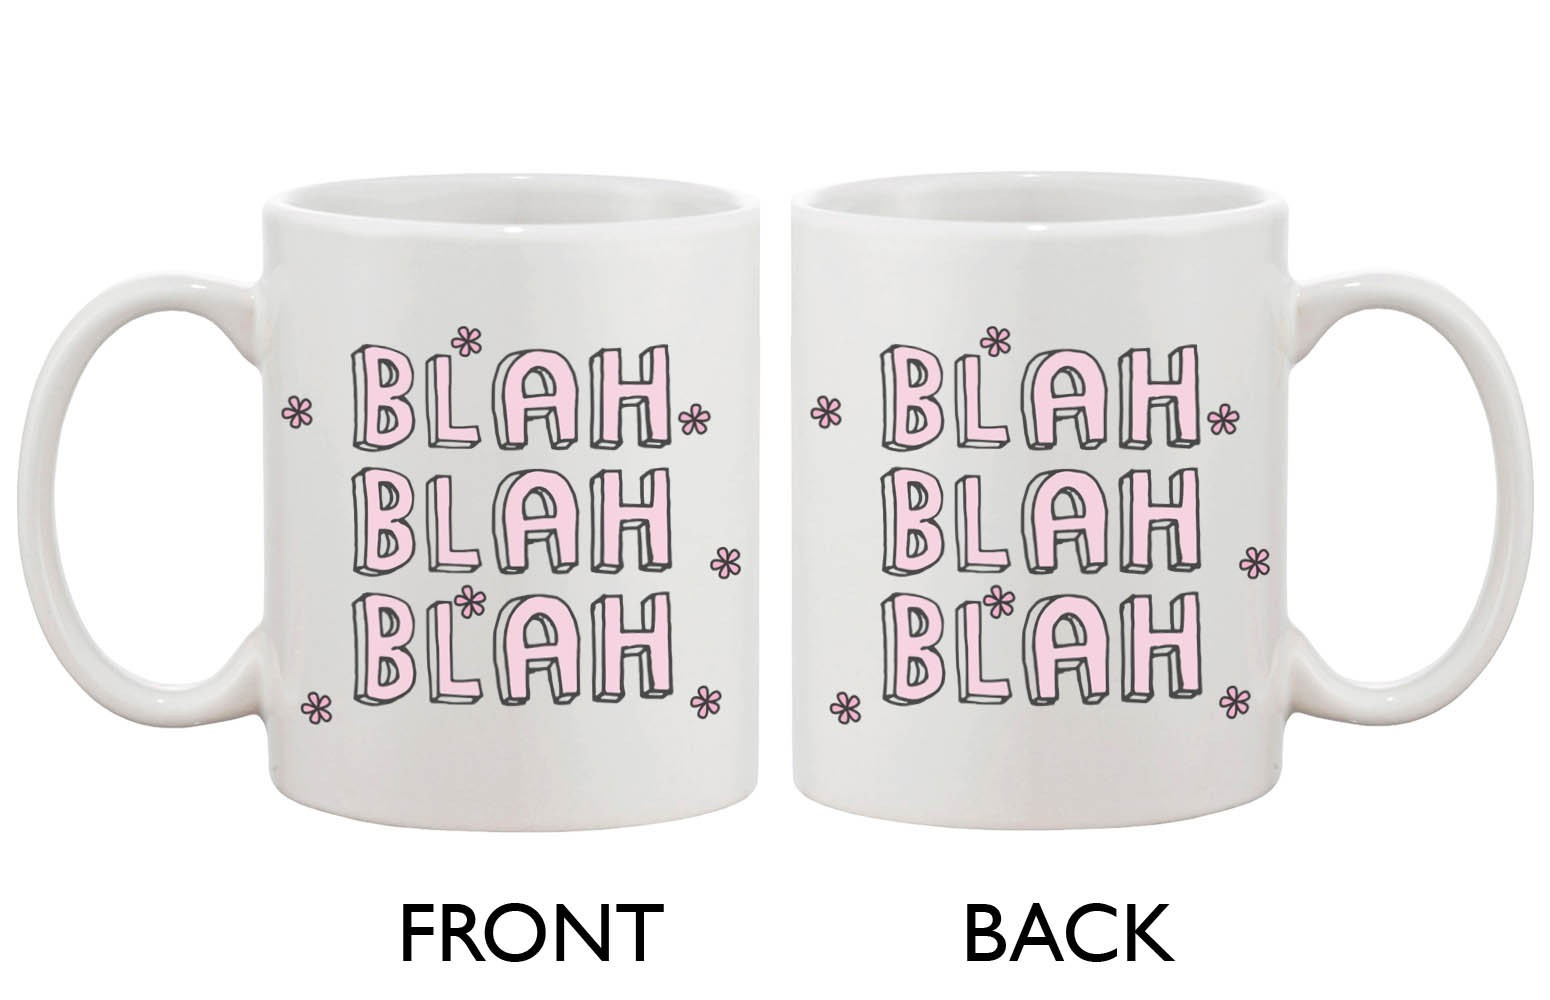 Cute Blah Blah Blah Mug - BLAH BLAH BLAH